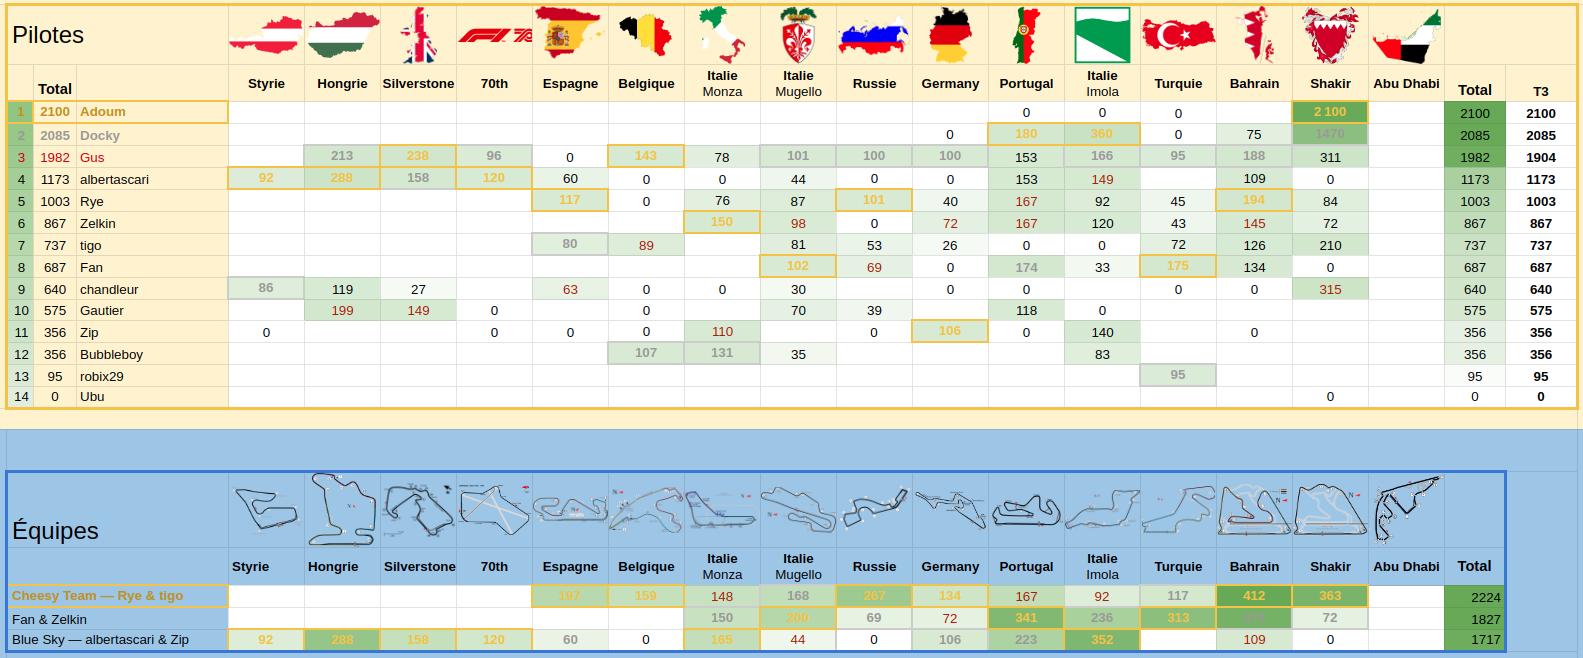 GP D'ABU DHABI-Formula 1 Etihad Airways Abu Dhabi Grand Prix 2020 Screenshot-from-2020-12-08-11-02-51